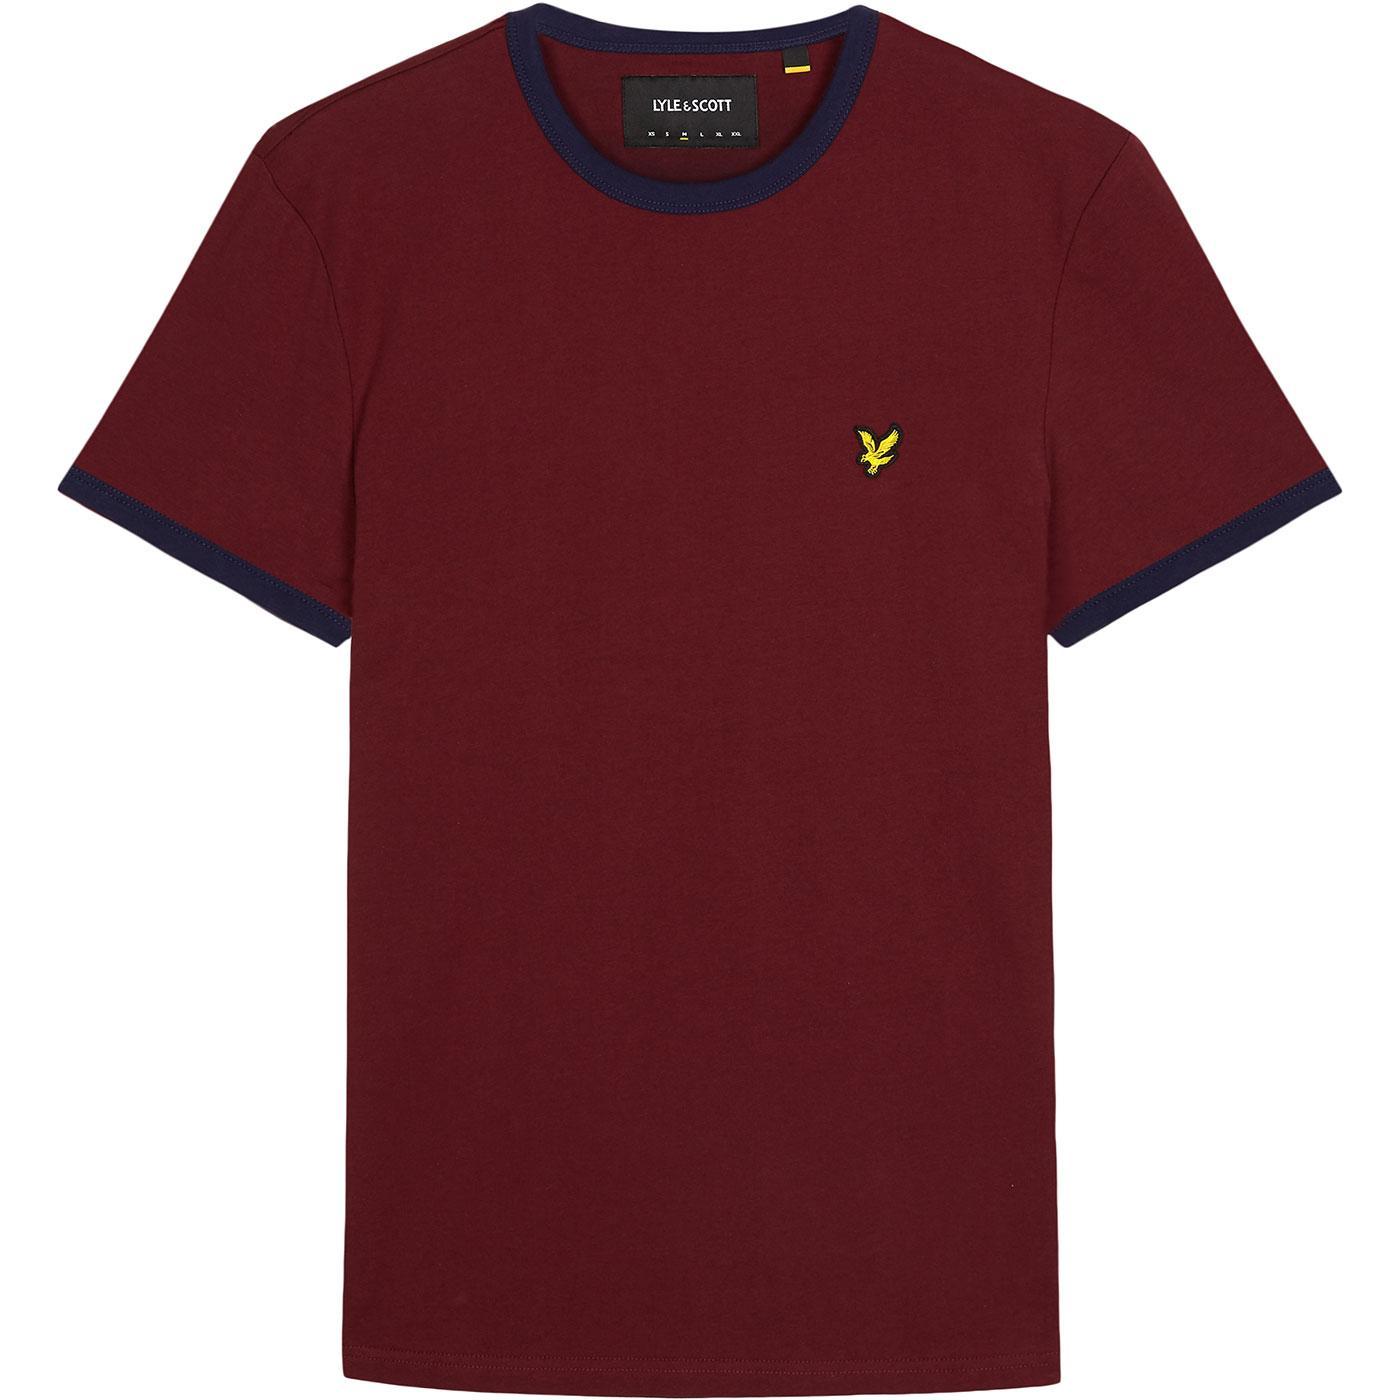 LYLE & SCOTT Retro Ringer T-Shirt (Claret Jug)